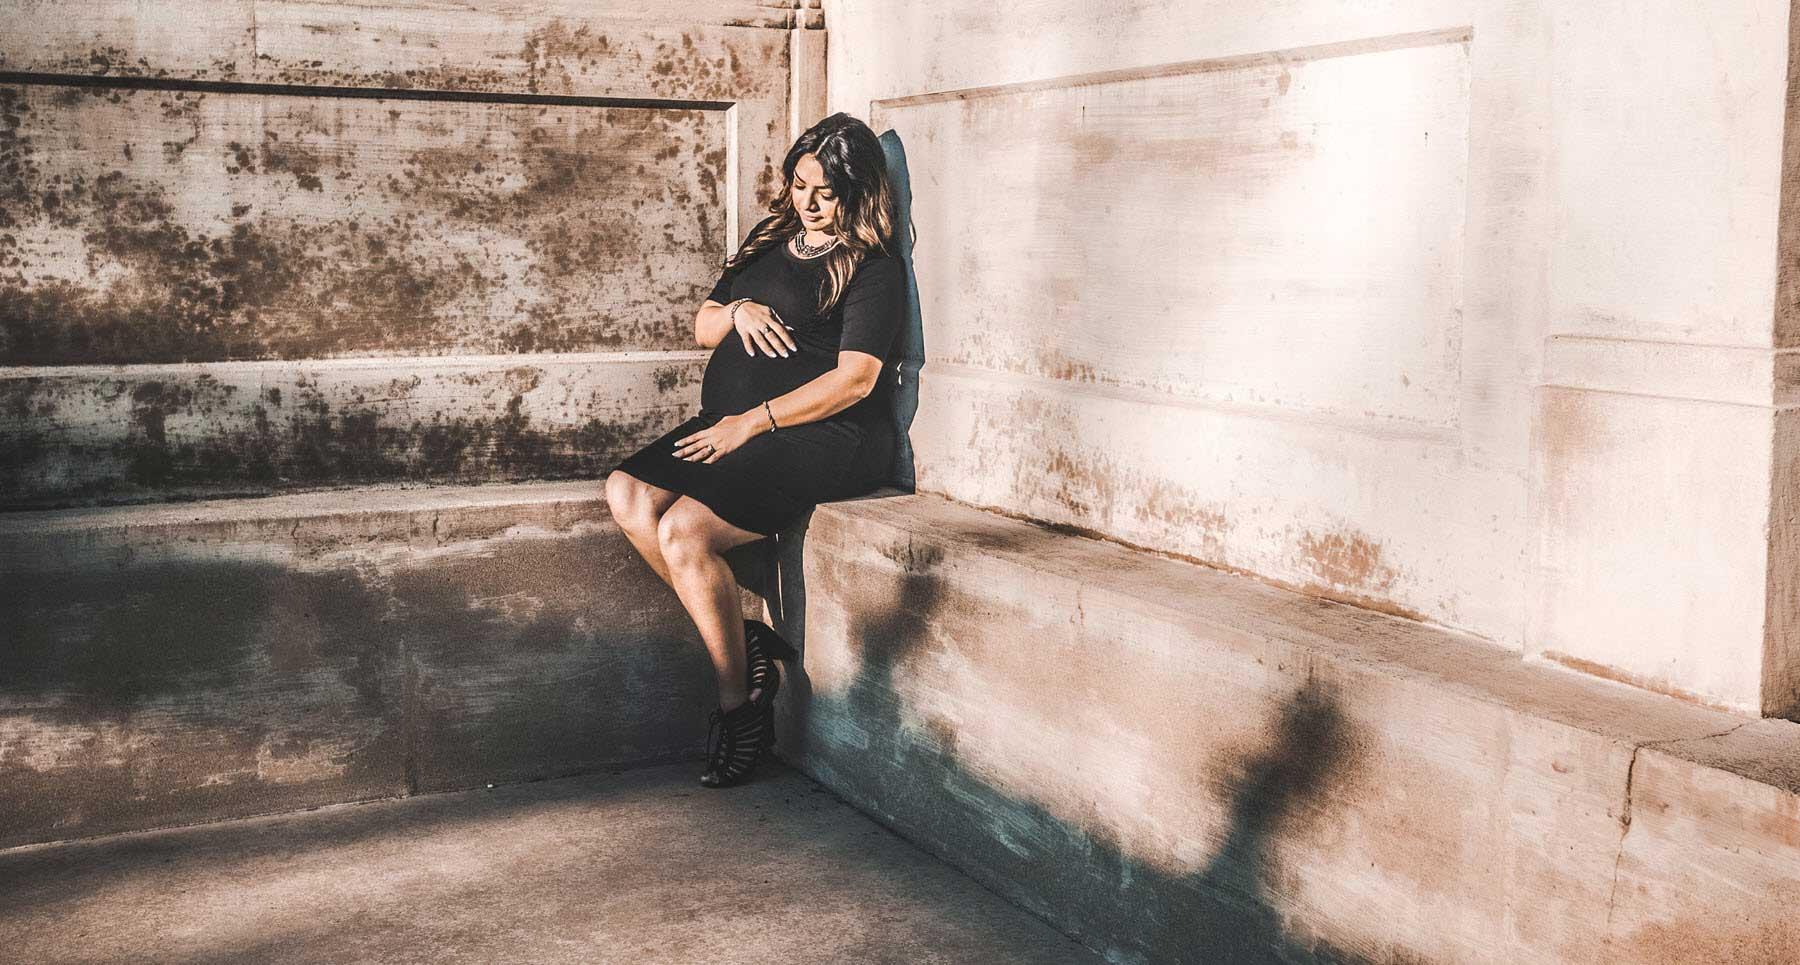 Woman facing depression after adoption